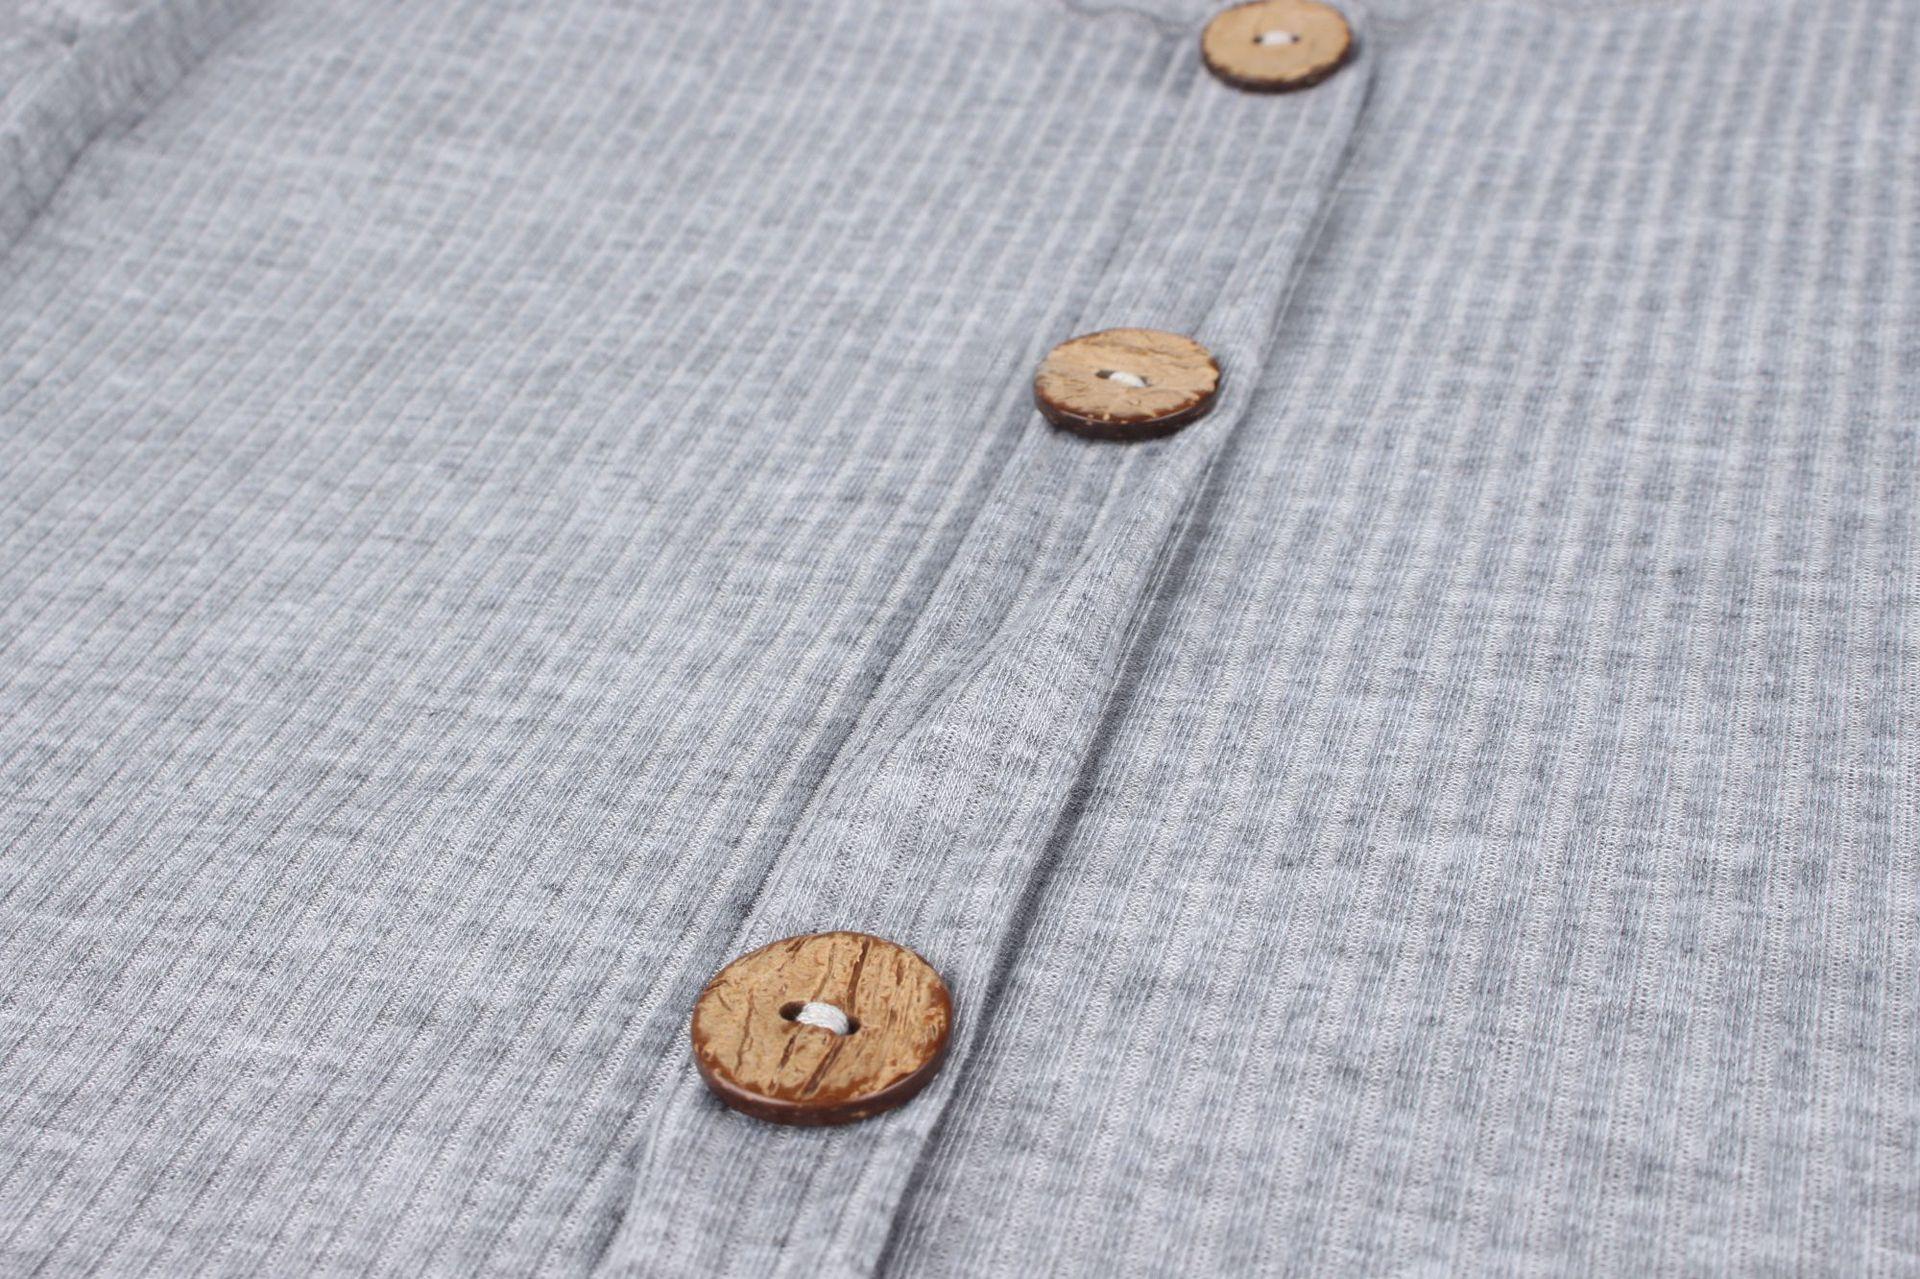 Crop Top Women Long Sleeve Button O-neck Spring Summer T Shirt Women Sexy Camiseta Mujer Women Tshirt Tee Shirt Femme 2019 Tops224